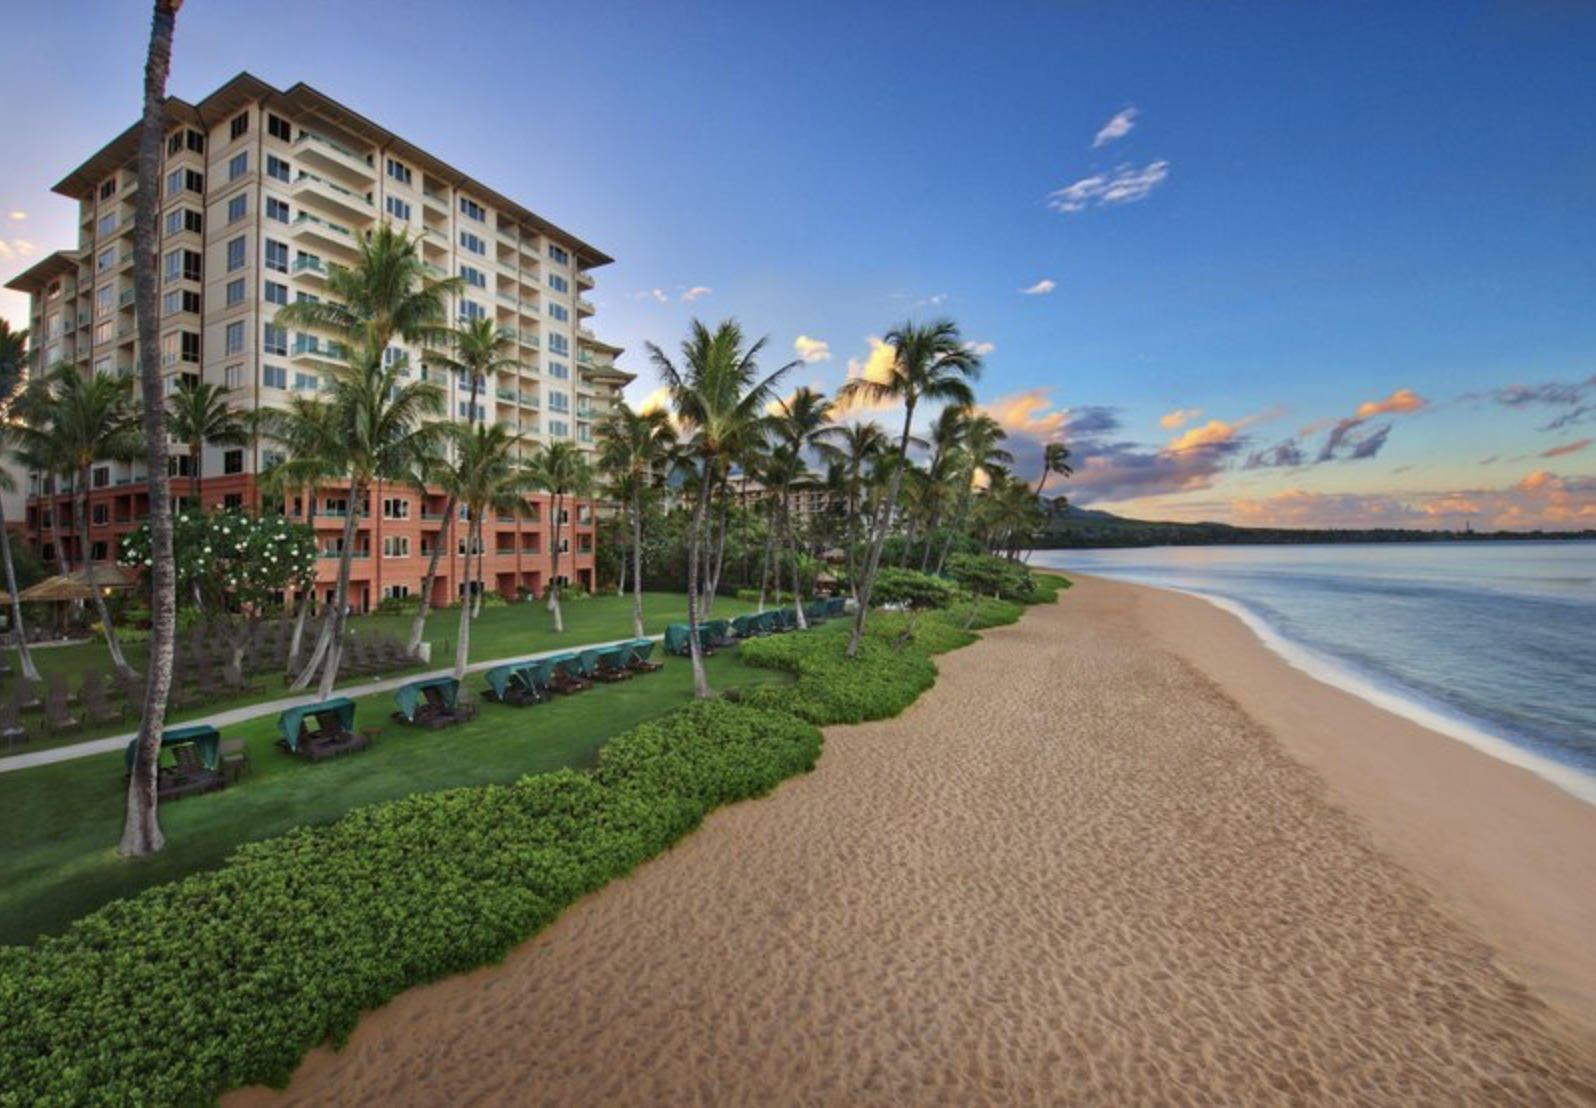 16. Marriott Maui Ocean Club